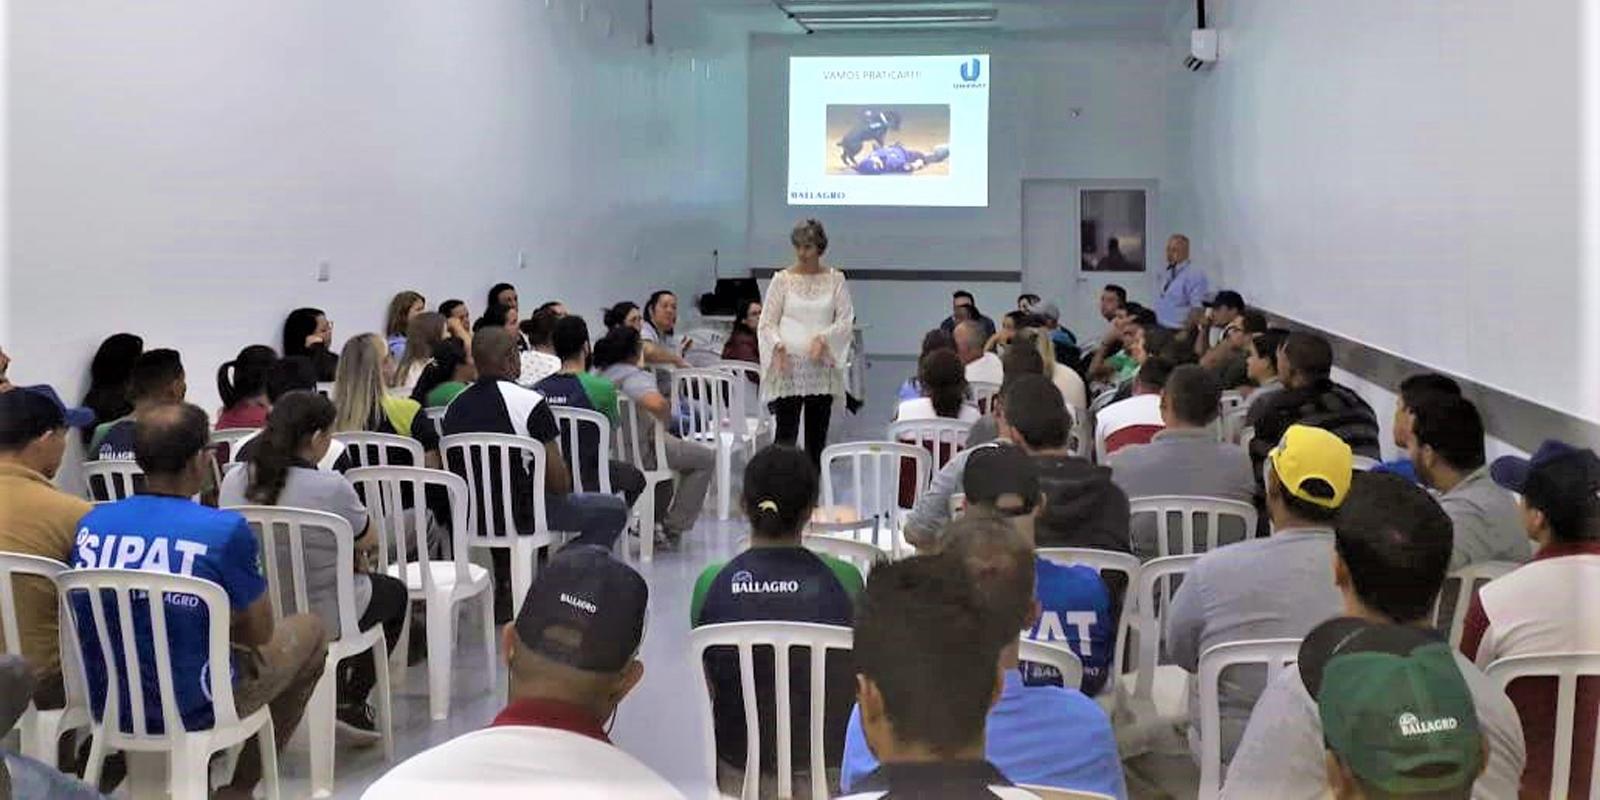 UNIFAAT Empresas realiza palestras em empresas durante a SIPAT